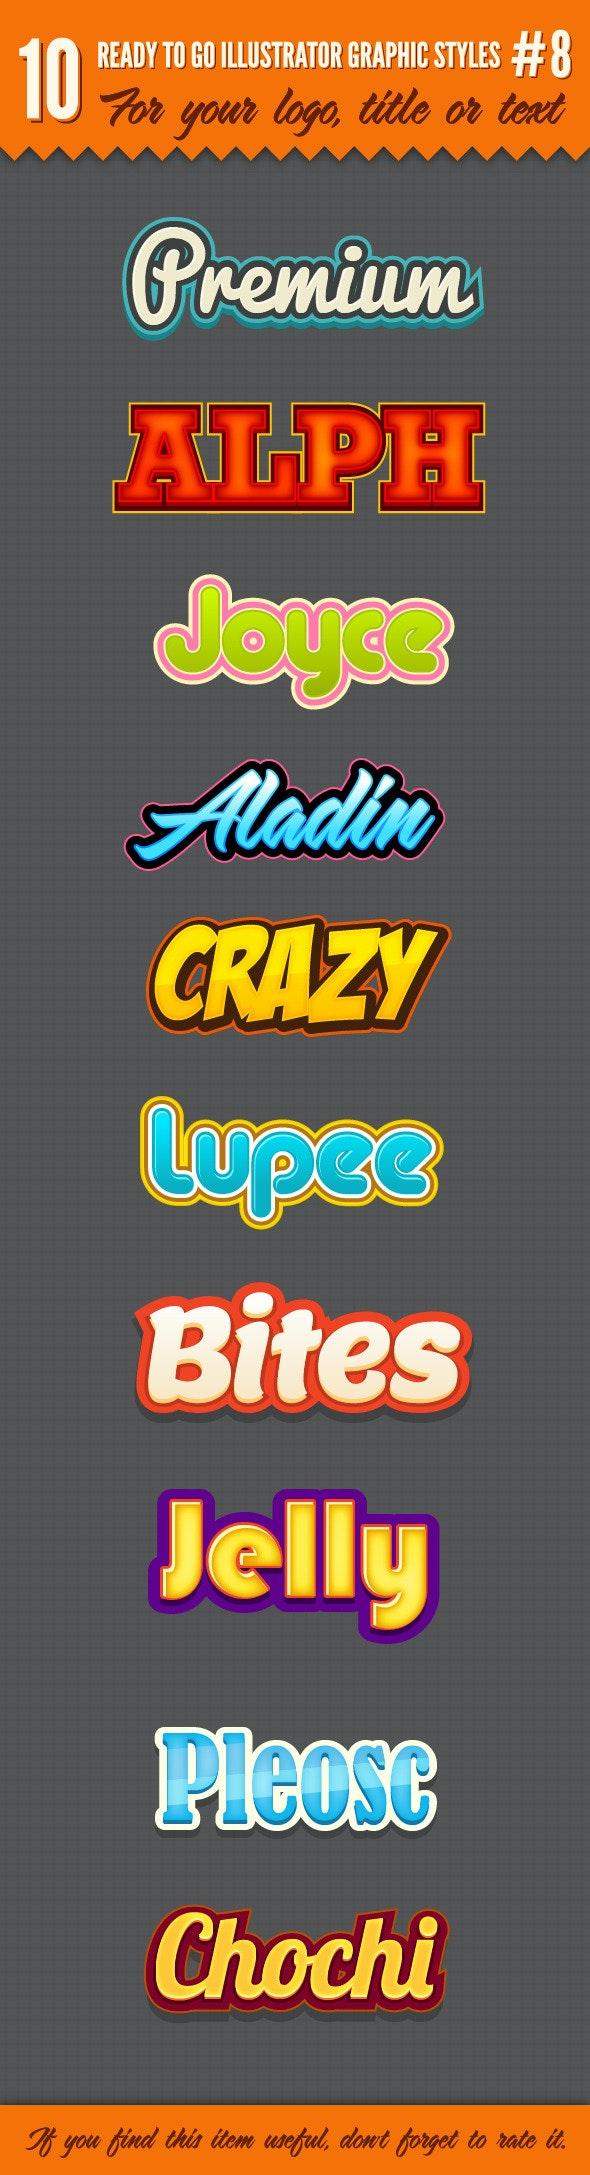 10 Logo Graphic Styles #8 - Styles Illustrator